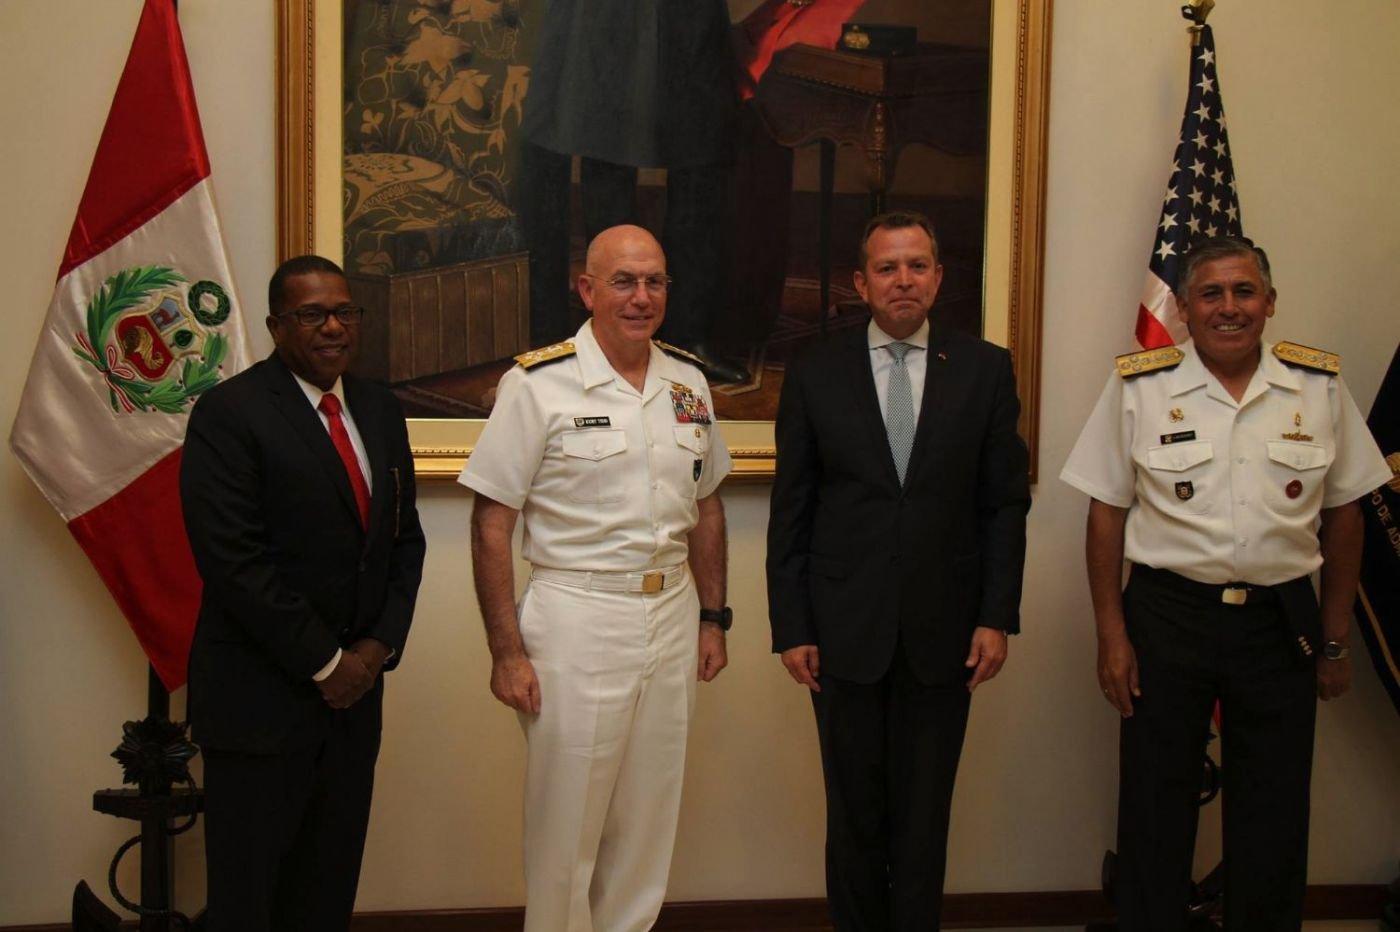 U.S. Admiral Tidd Meets Peruvian Defense Minister Valakivi to Discuss Bilateral Issues